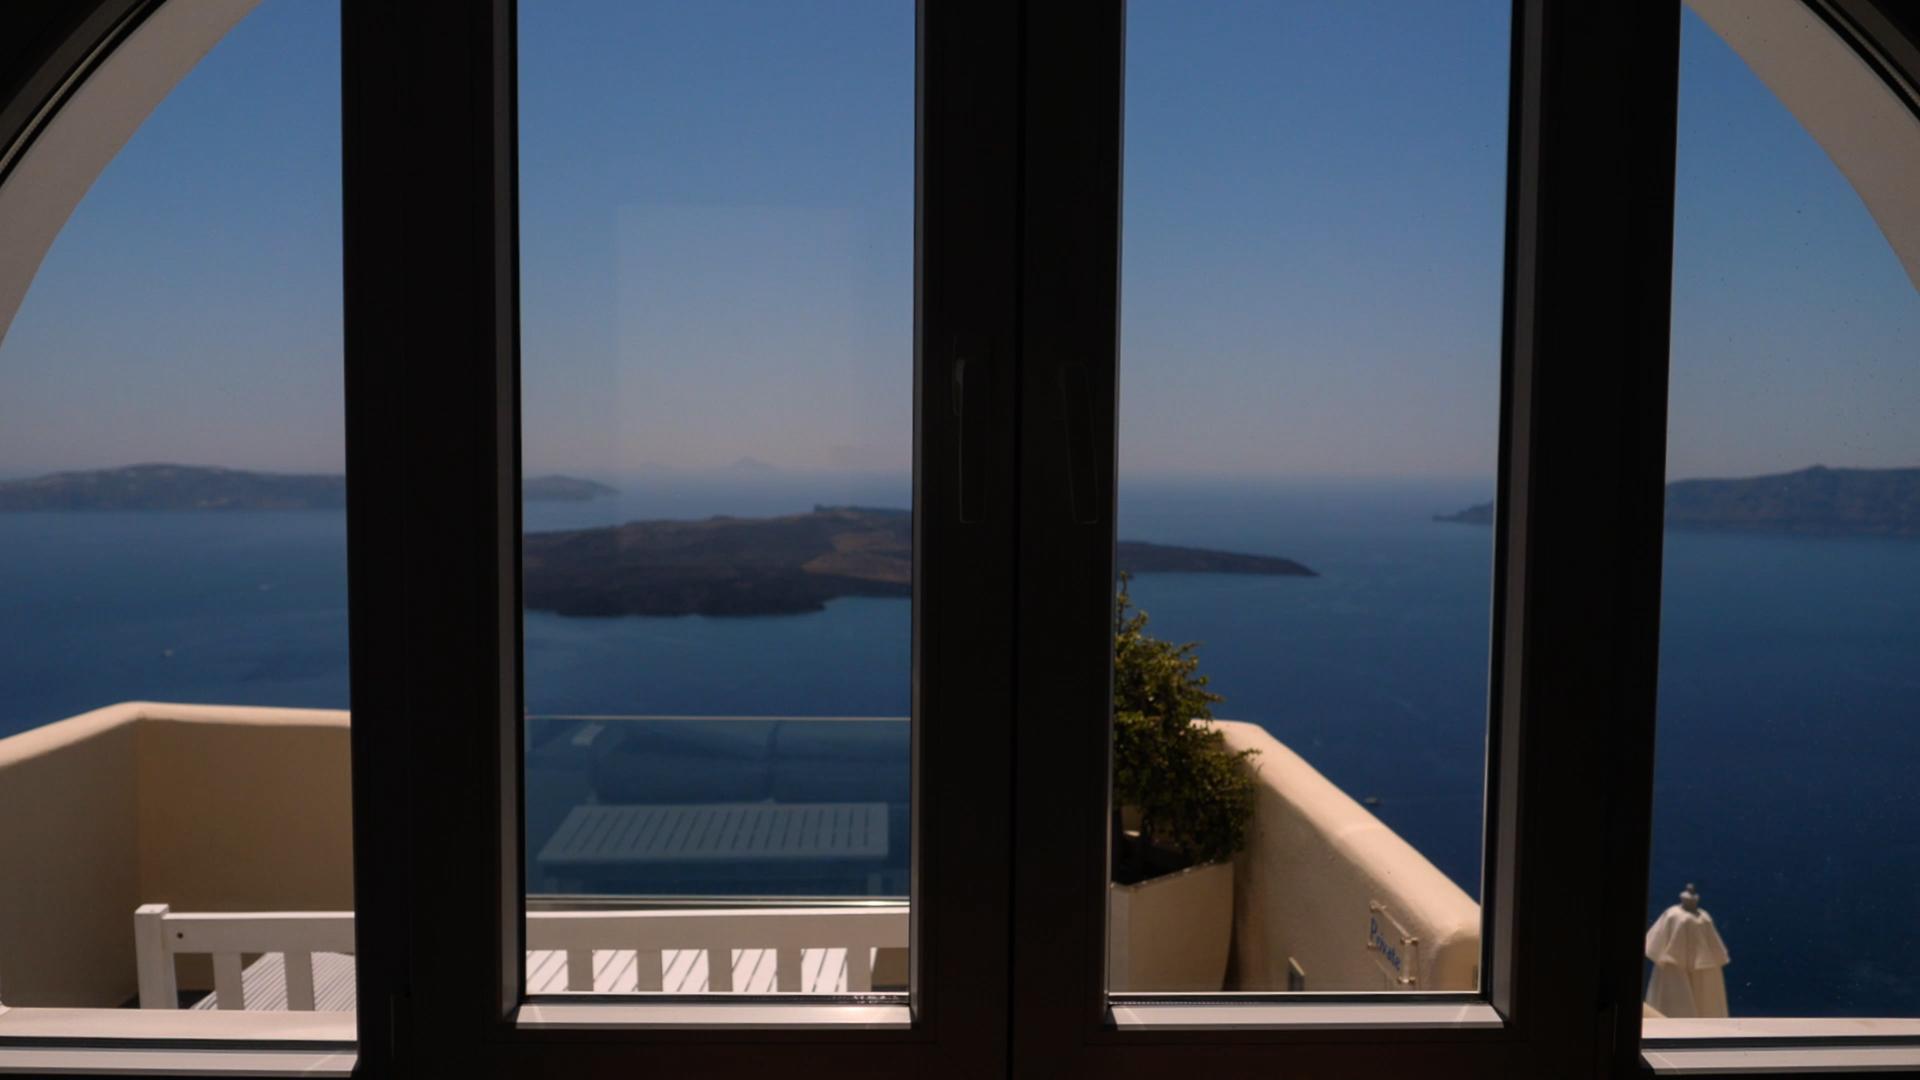 Santorini Wedding Videographer captures stunning view of the Caldera through groom's window.